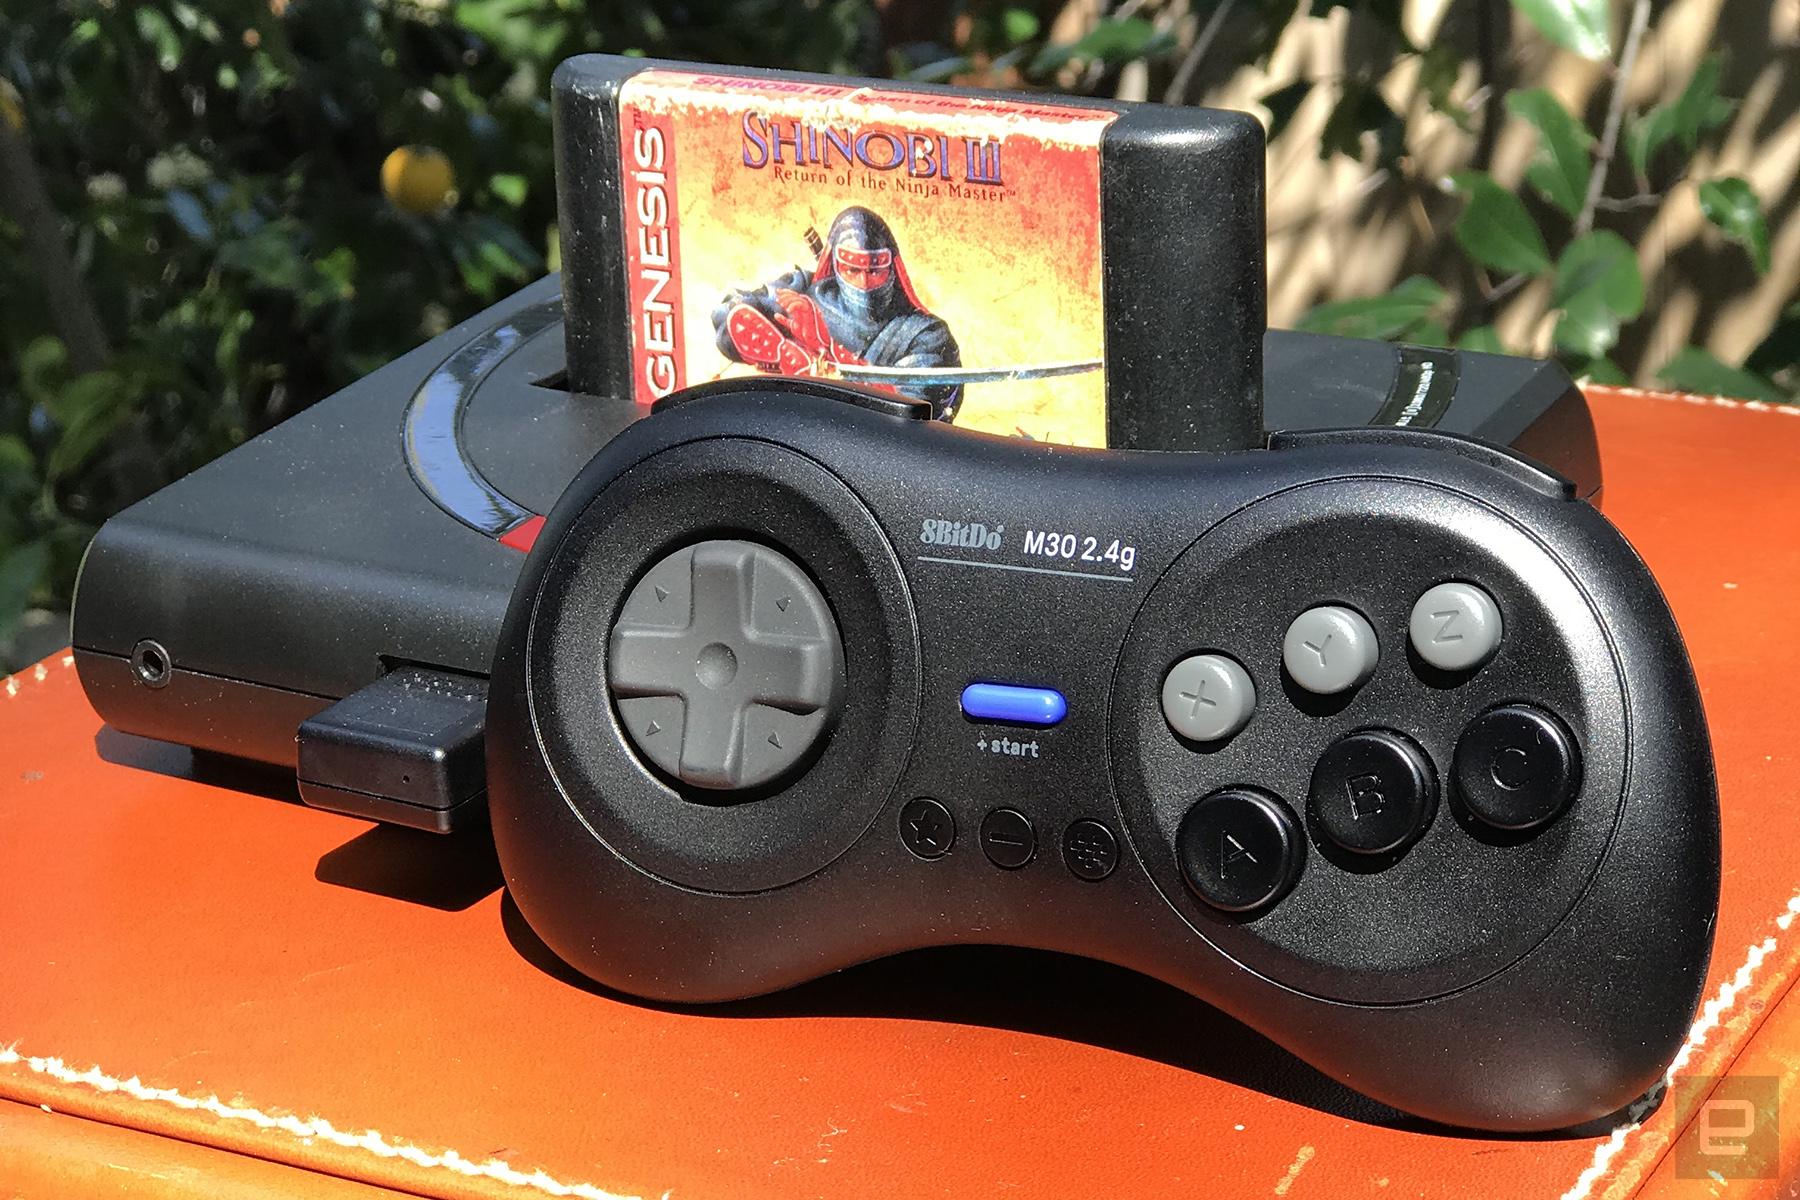 The Analogue Mega SG wins the retro gaming console war